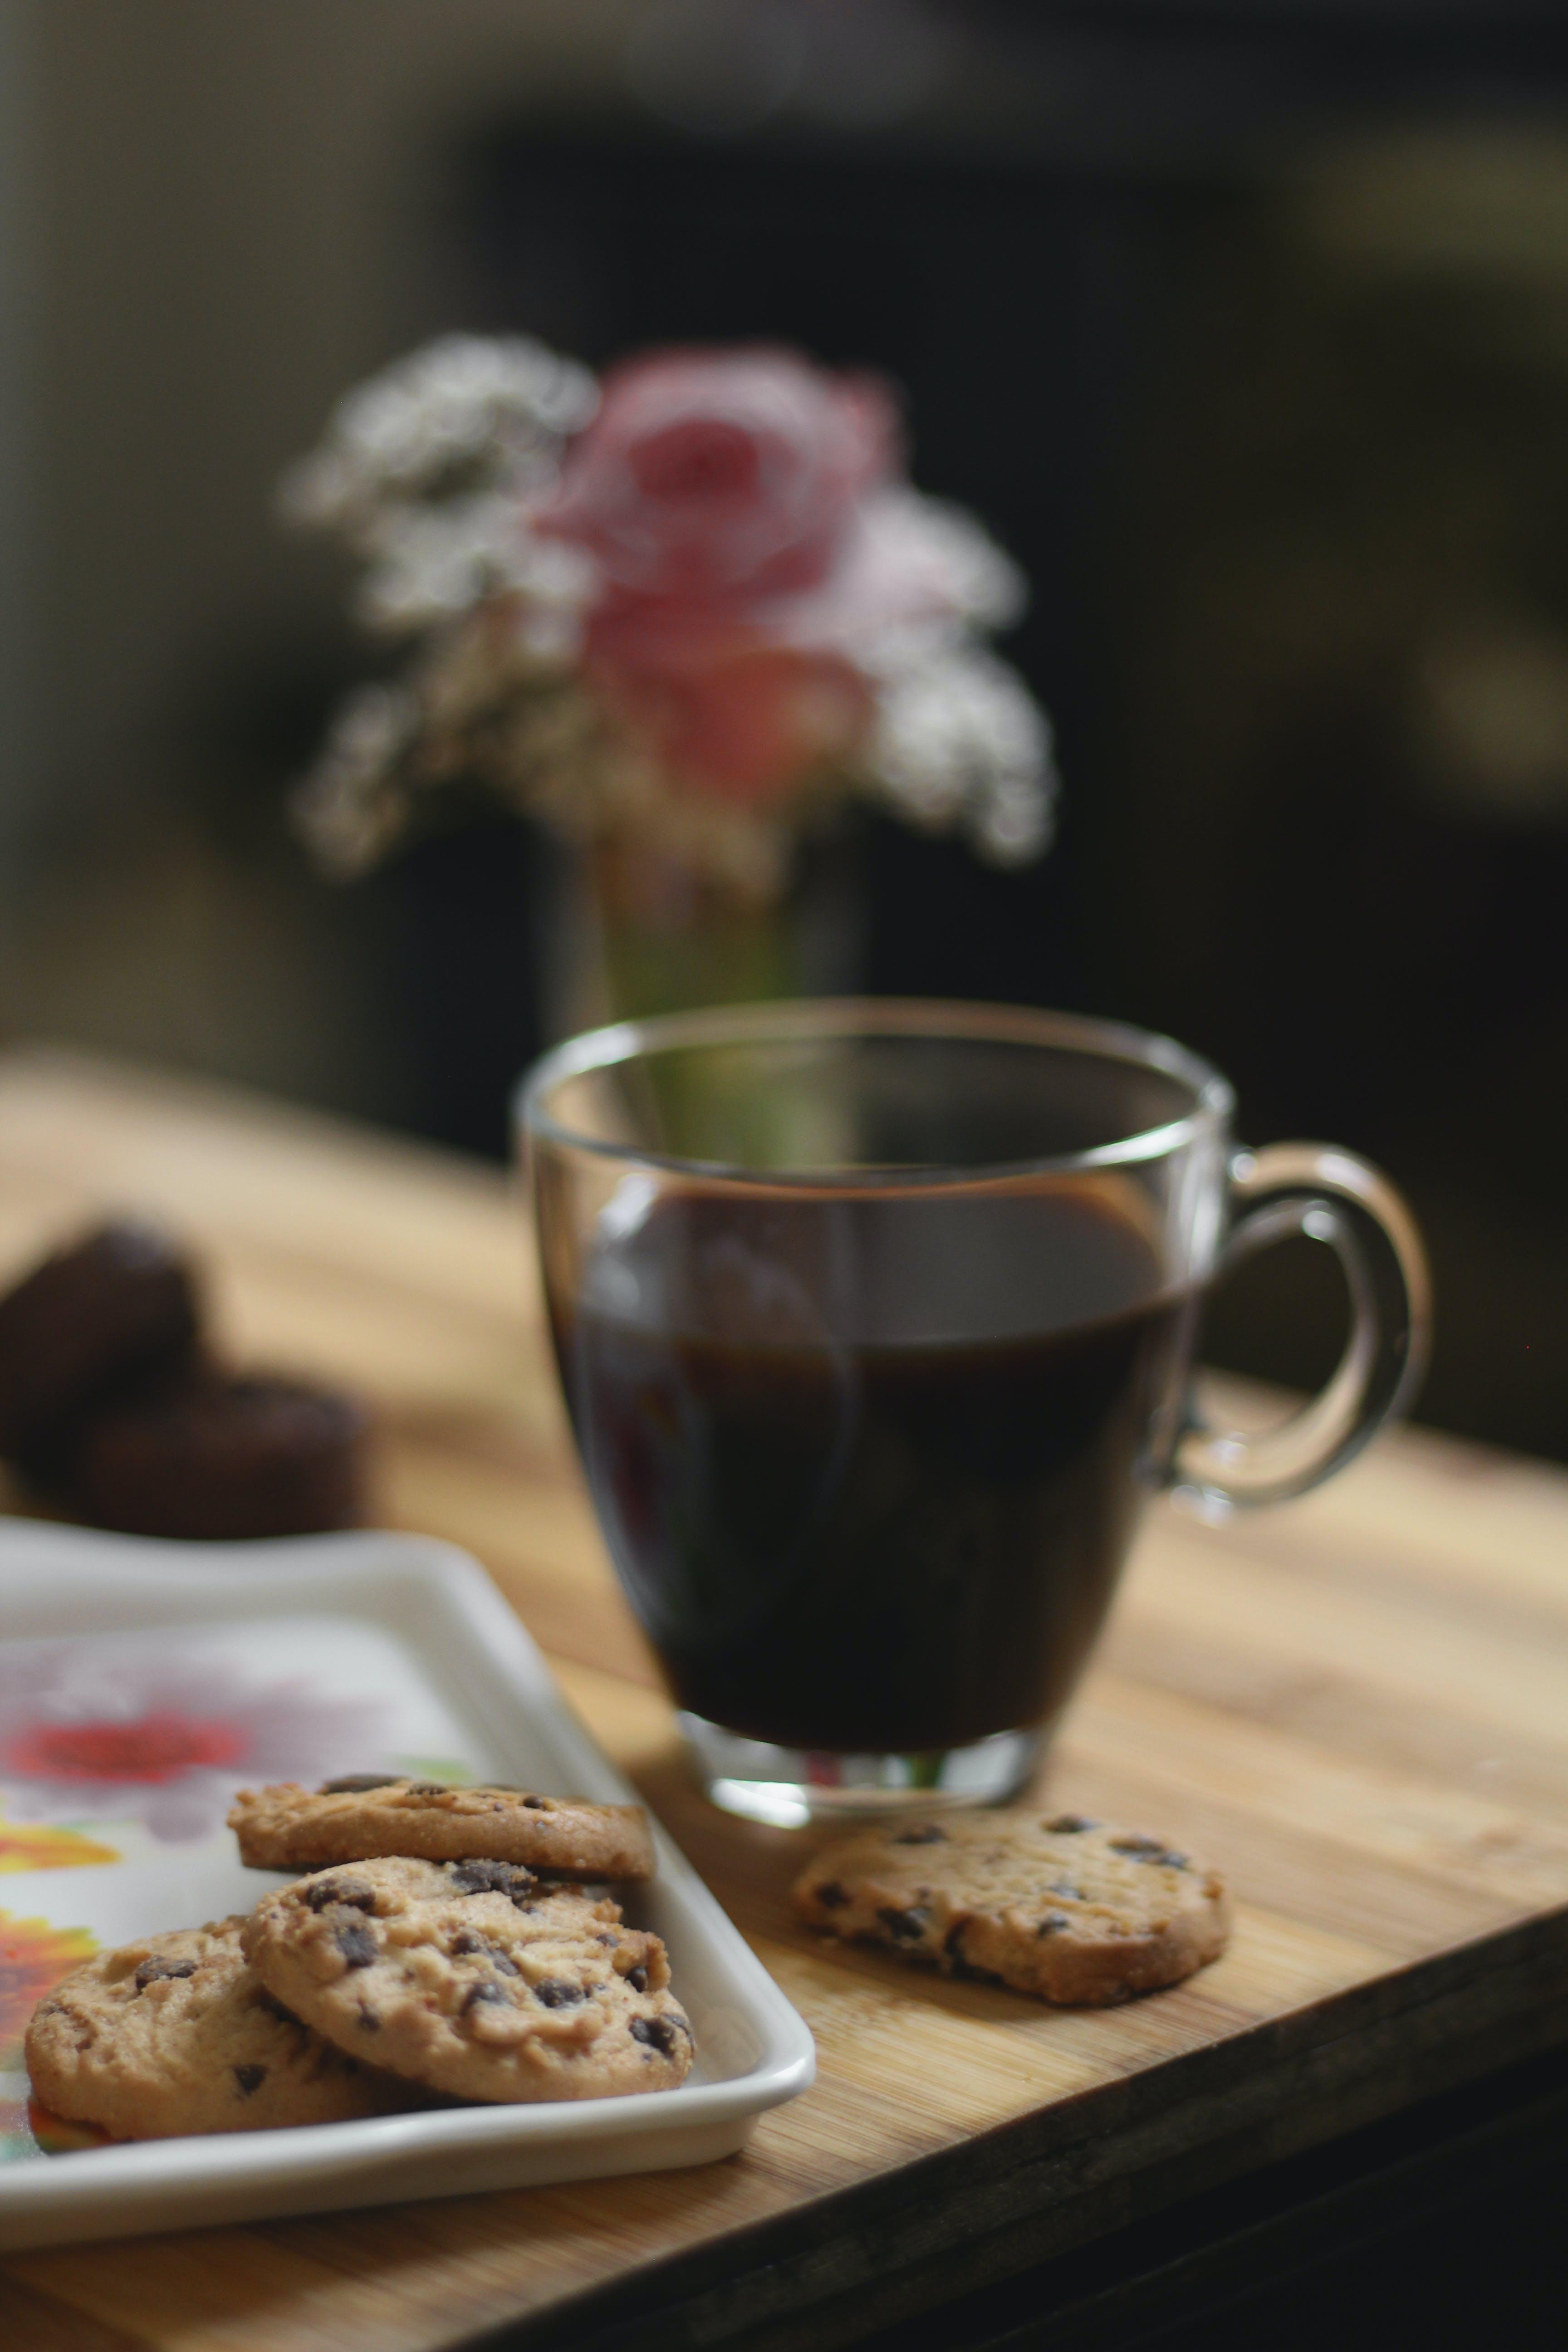 Kostenloses Stock Foto zu cookies, essen, frühstück, getränk